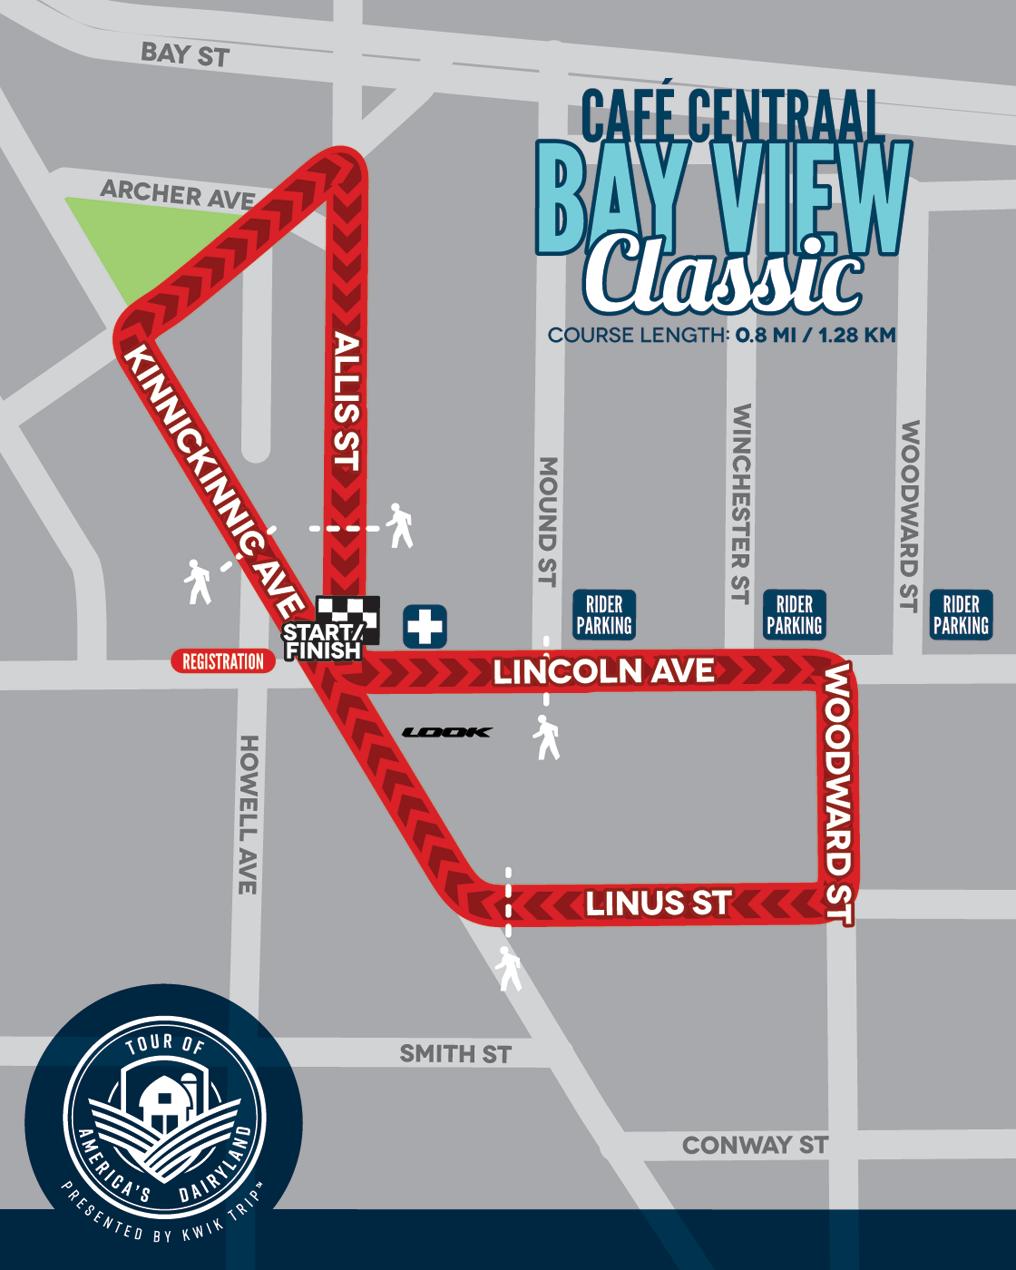 Café Centraal Bay View Classic Race Map